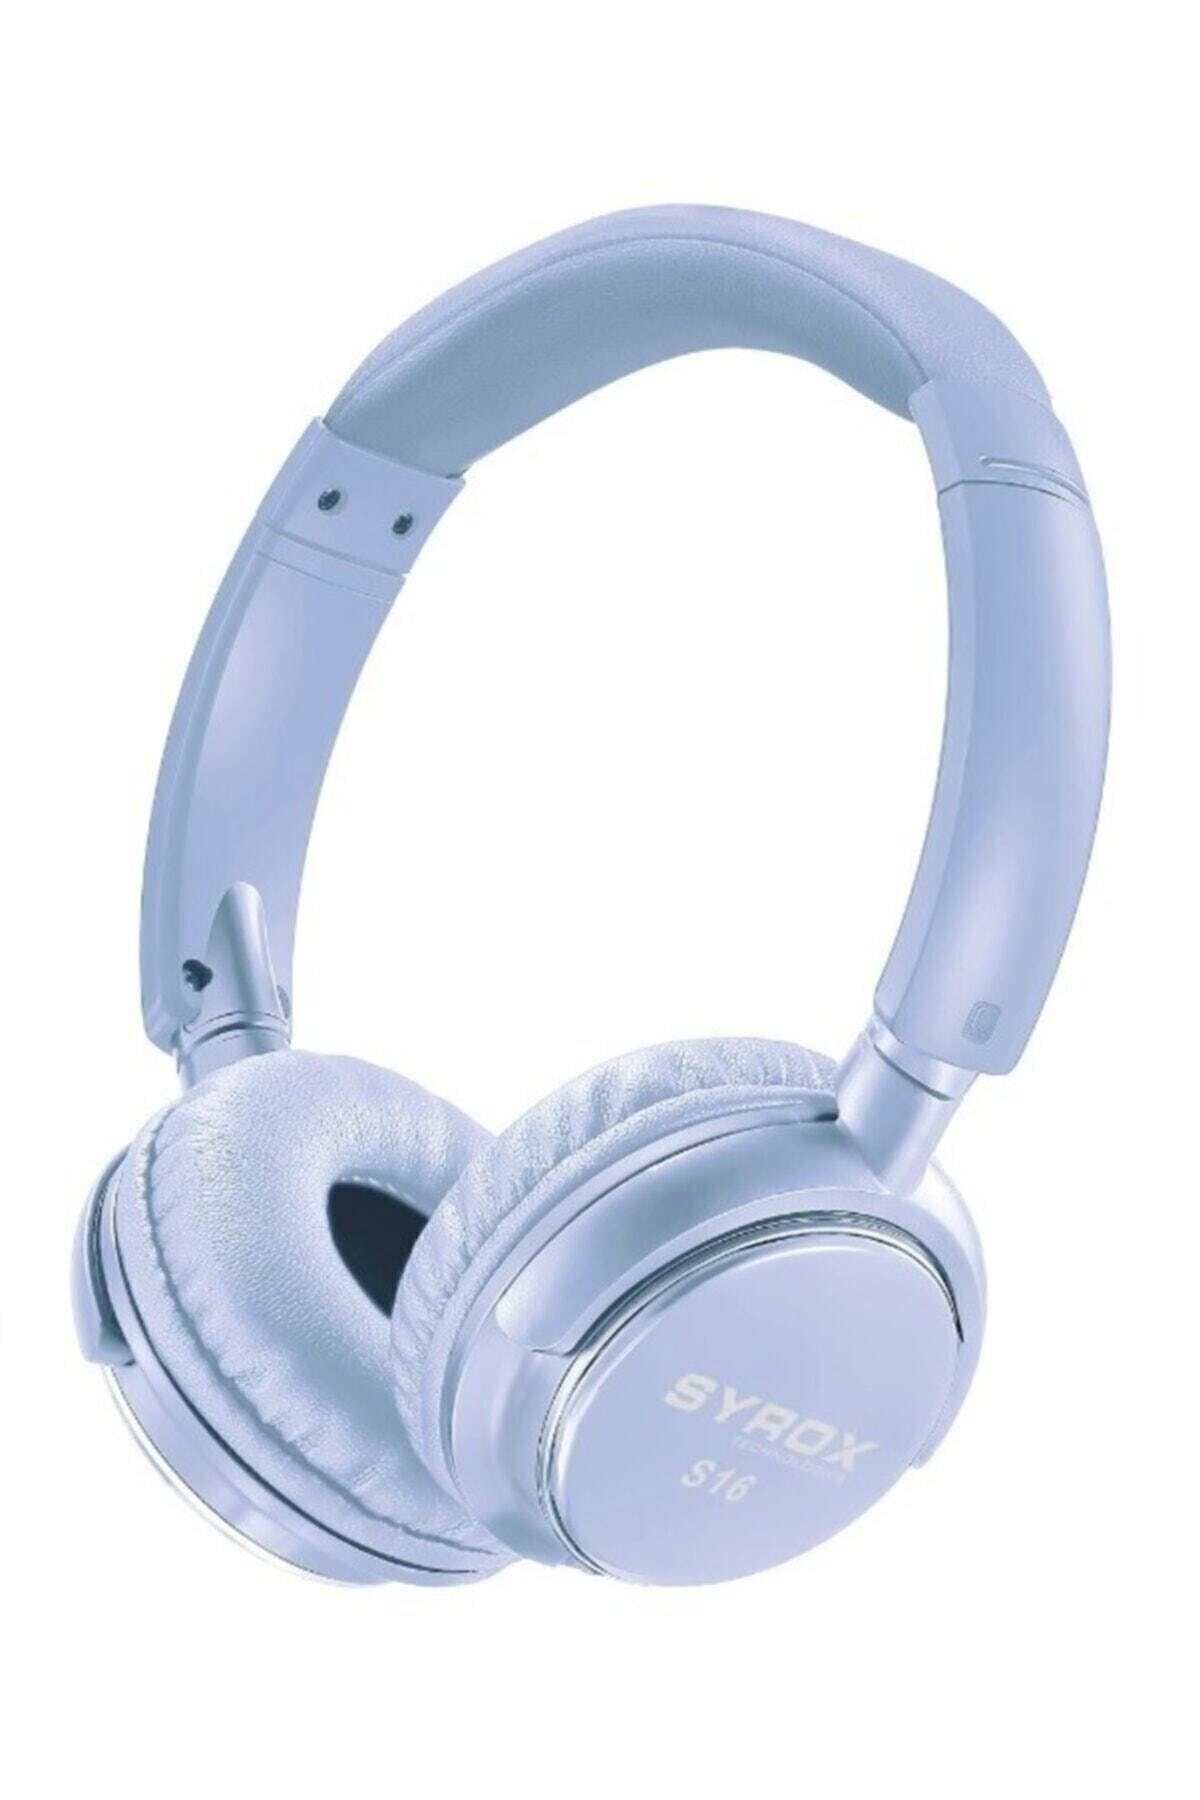 Sayrox Kablosuz Bluetooth Kulak Üstü Kulaklık S16 - Mavi Renk